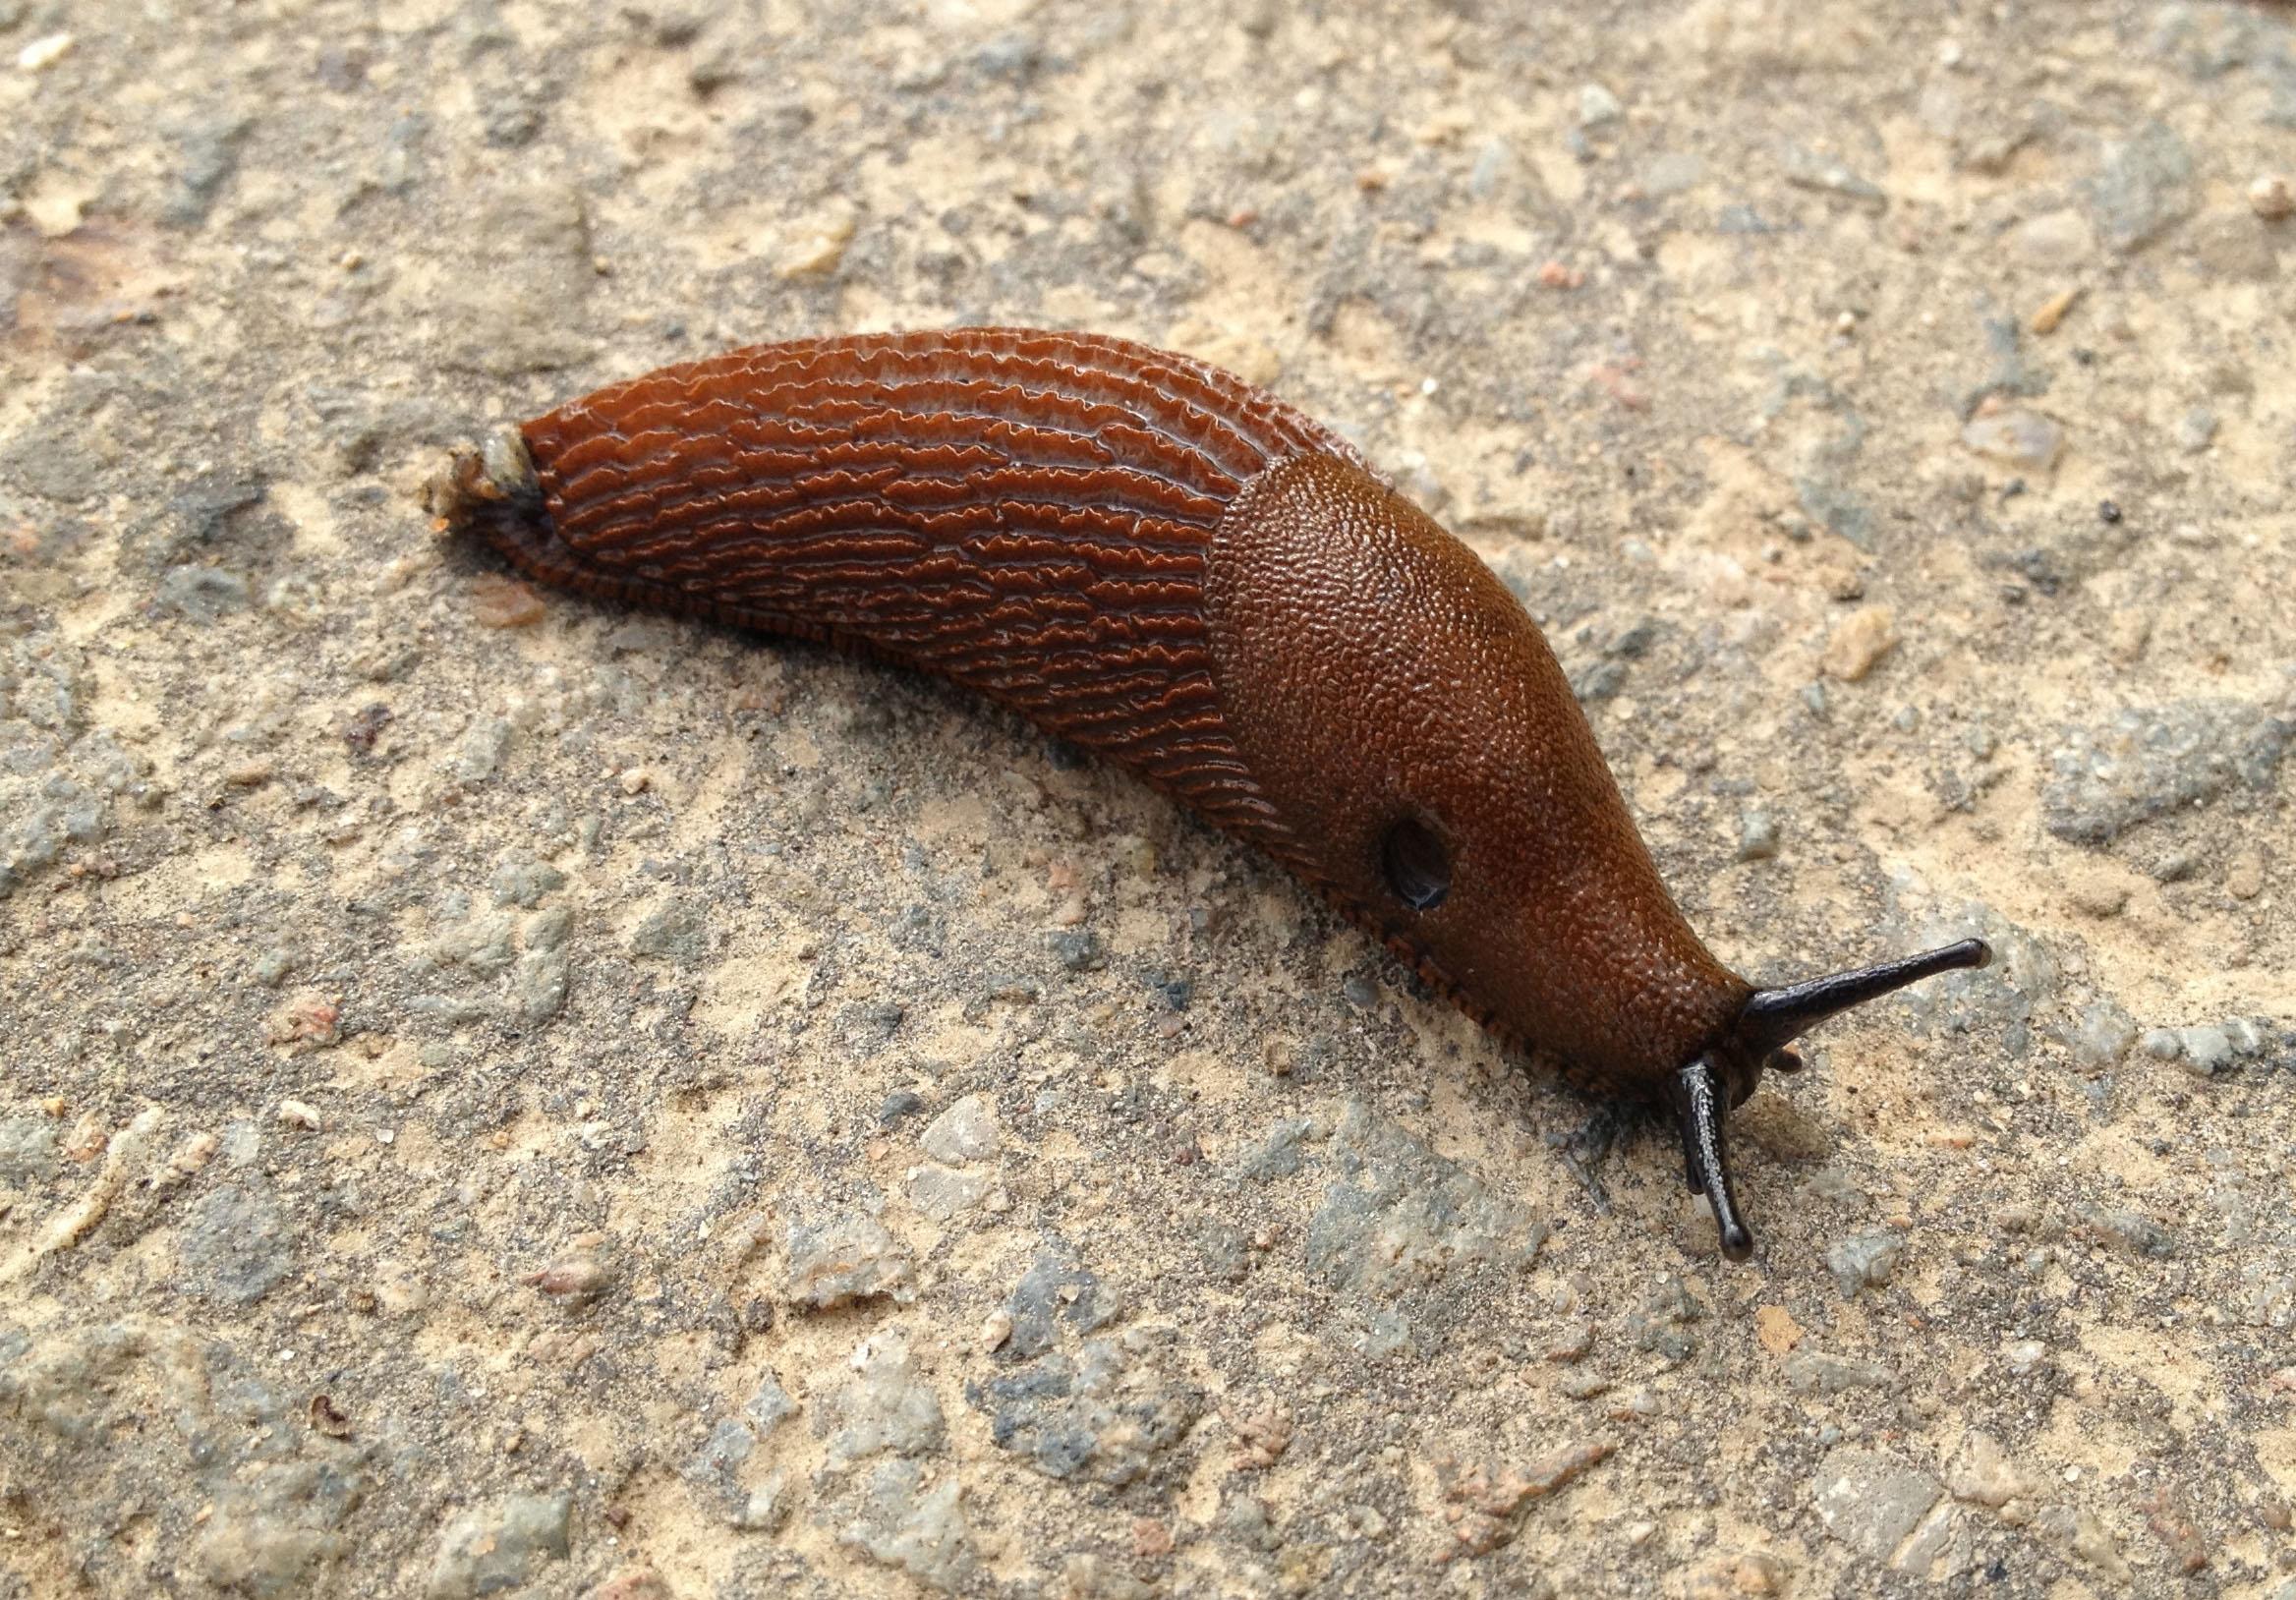 slugs snails and astonishing tales wild watch japan